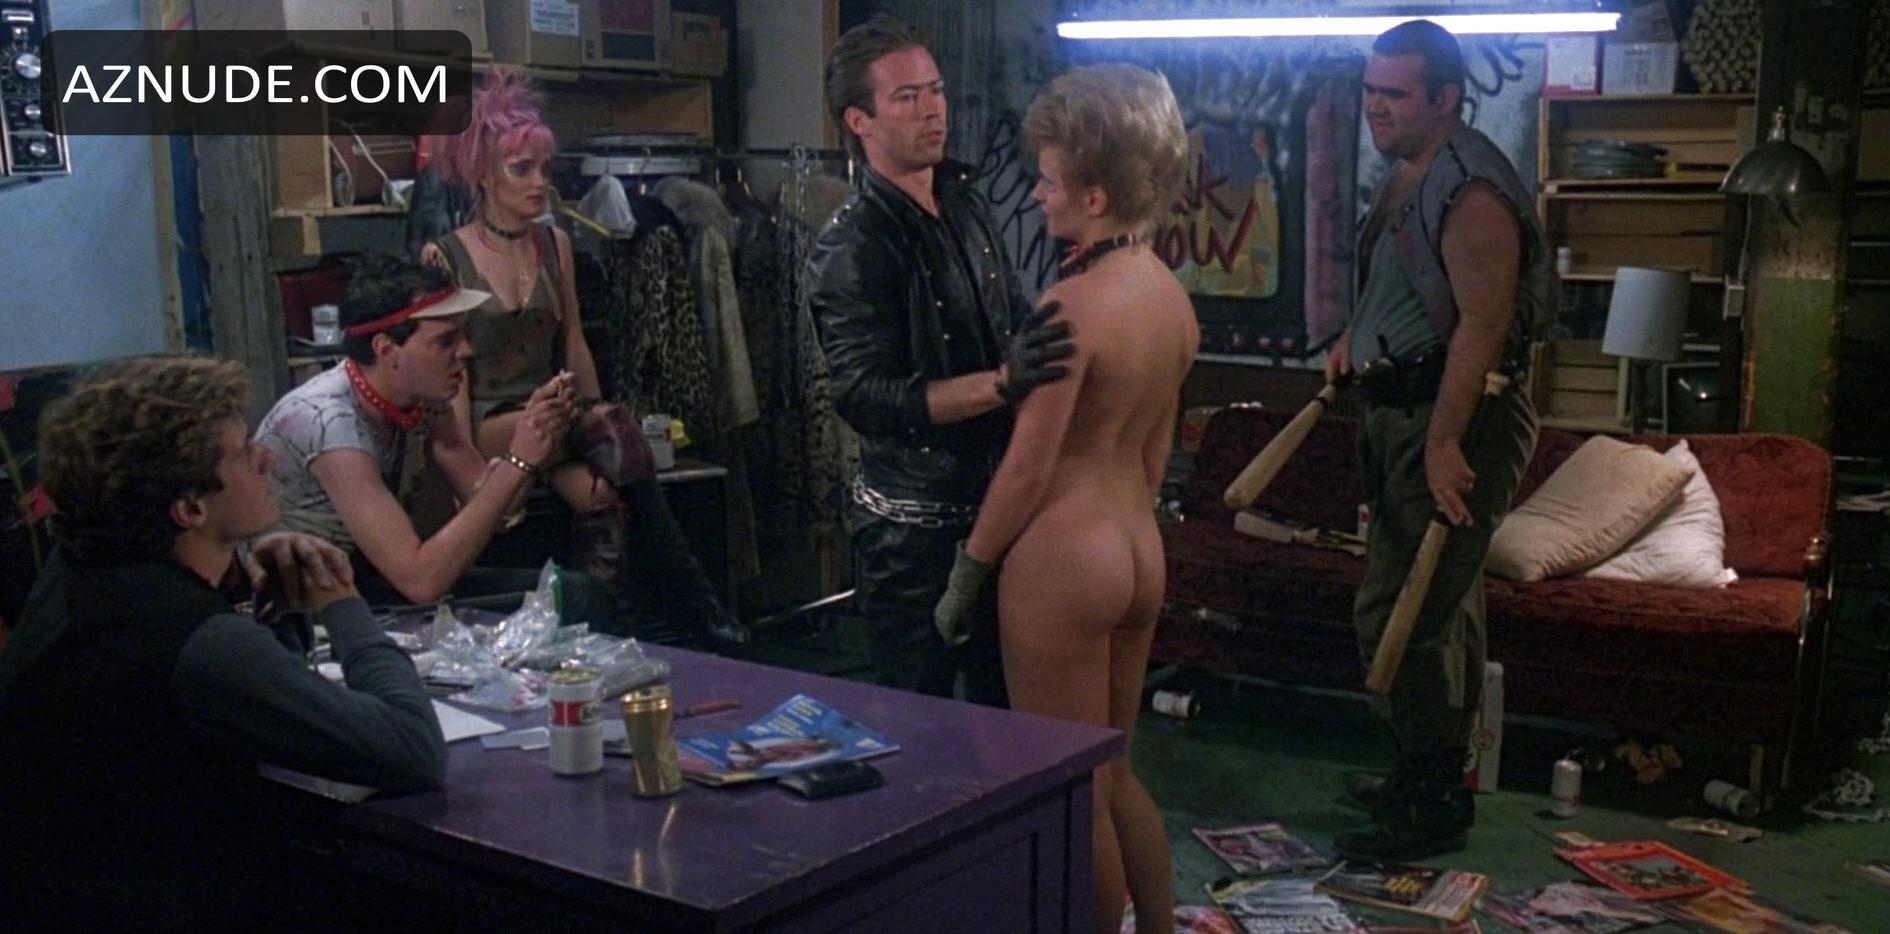 Angela Lansbury Nude Aznude